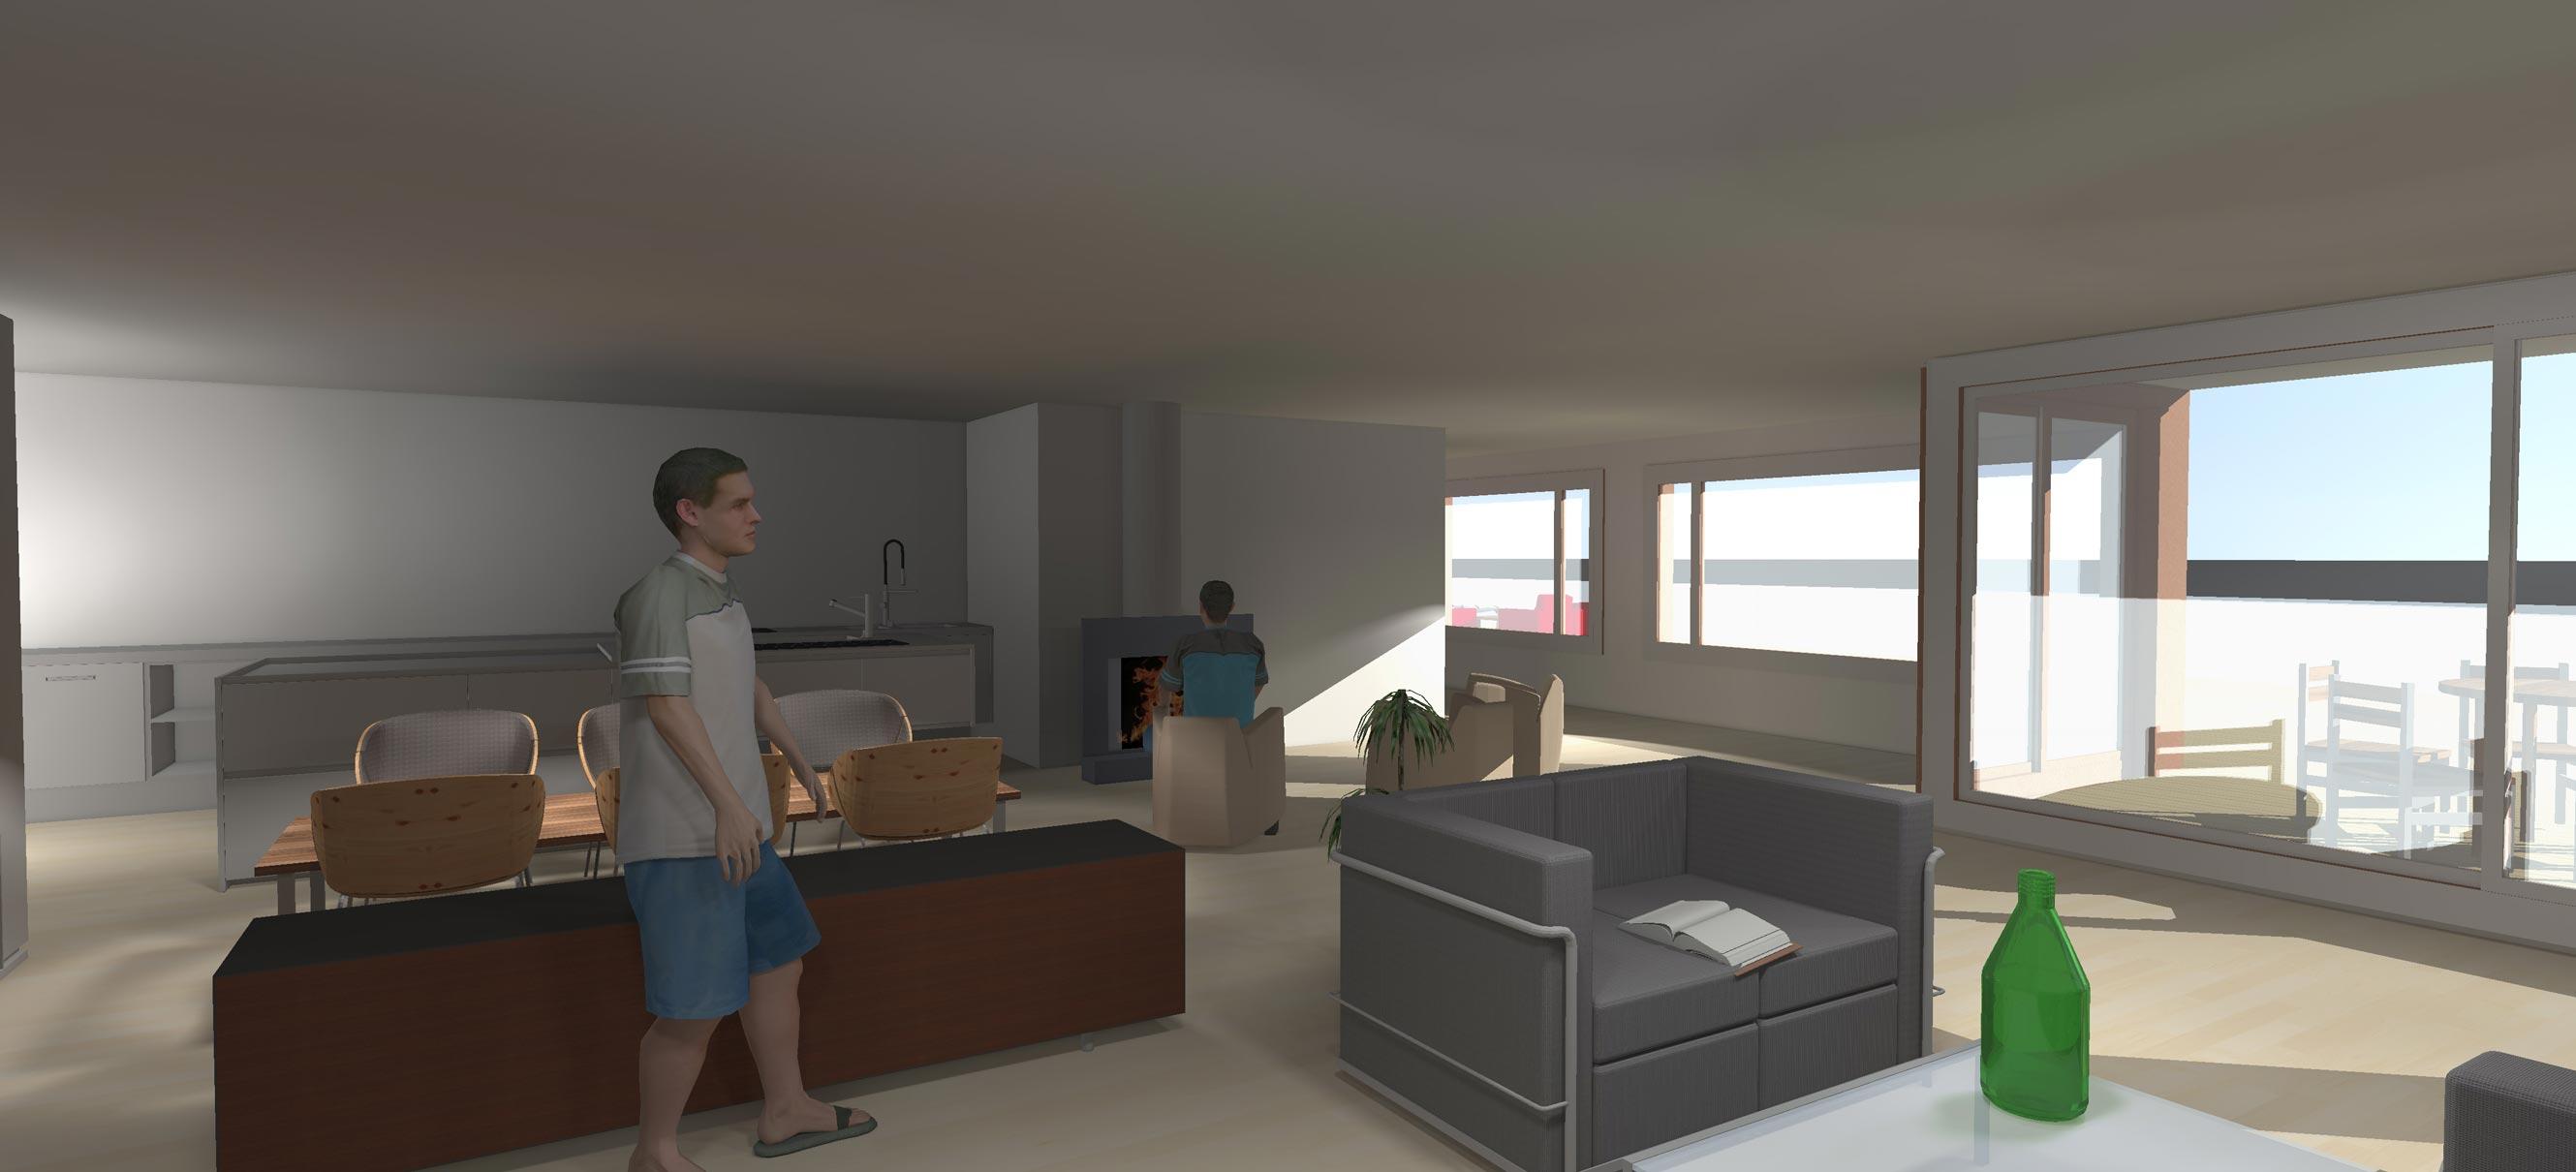 Schmid Partner Architekten Neubau C1204 ACCamera Innen3